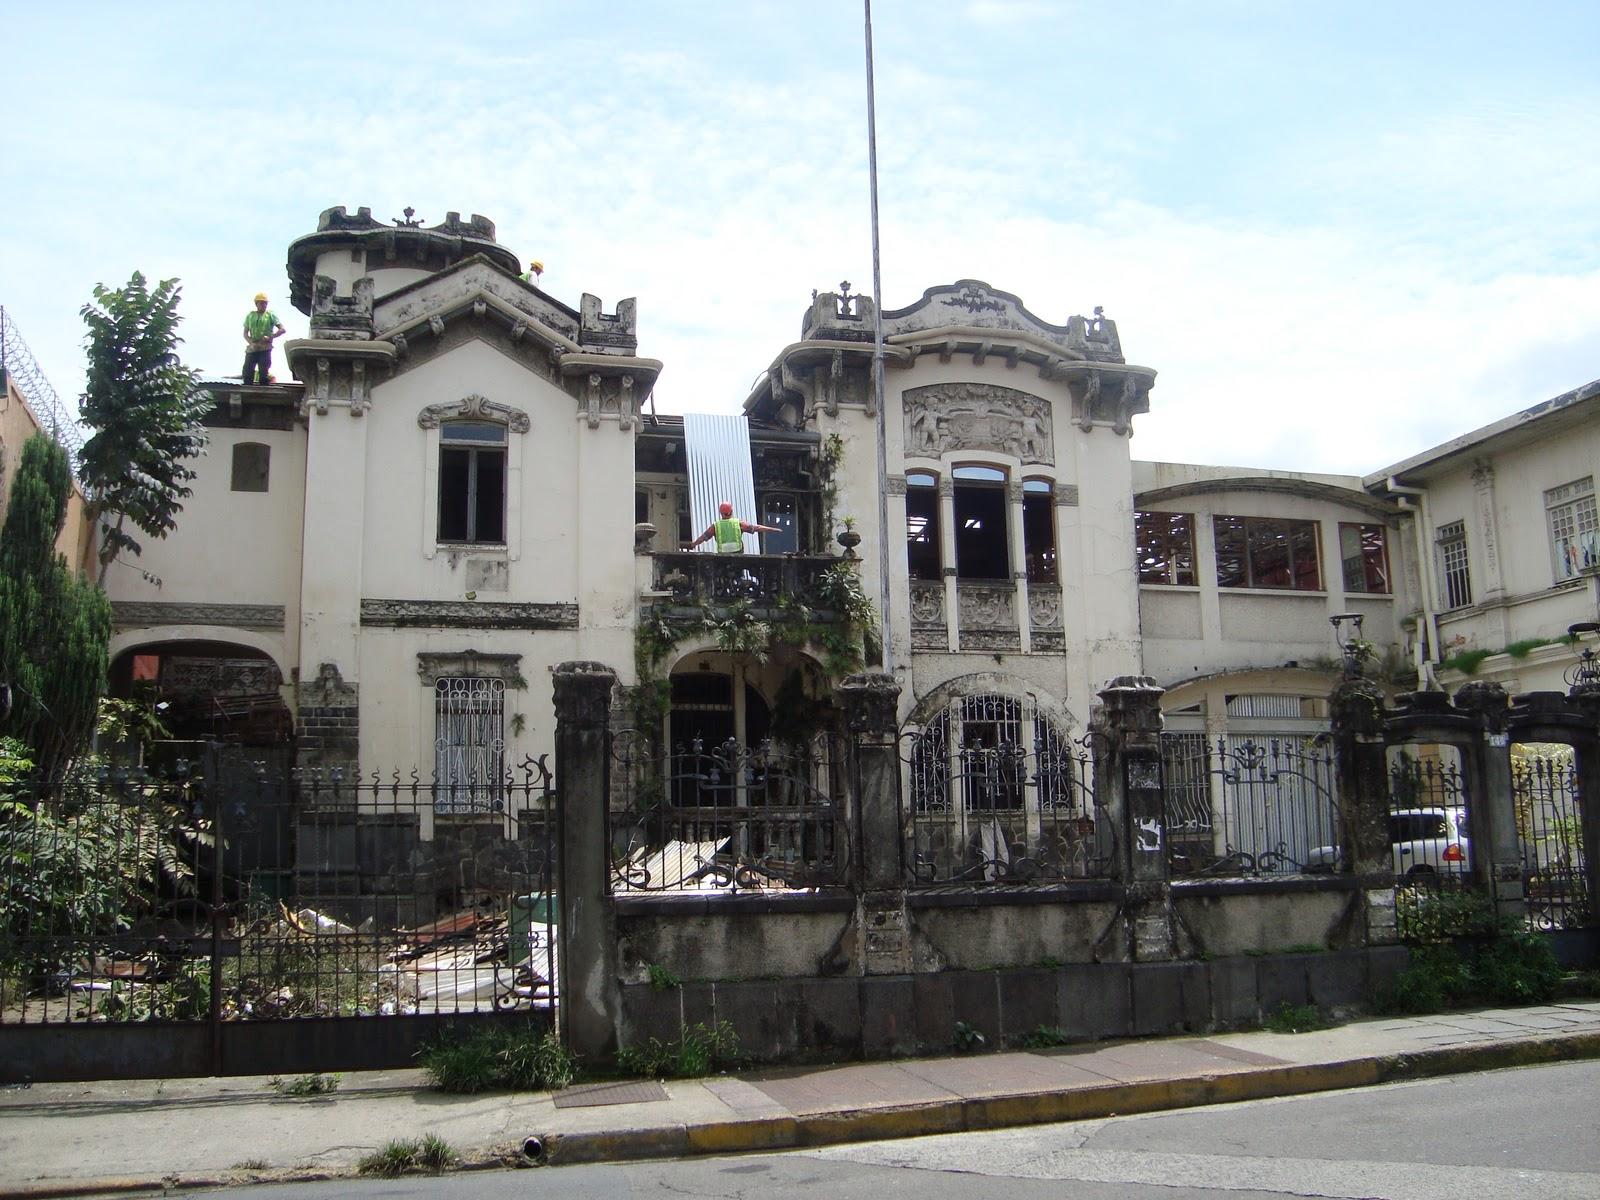 paseos art nouveau art nouveau san jos costa rica 3 casa jim nez de la guardia. Black Bedroom Furniture Sets. Home Design Ideas